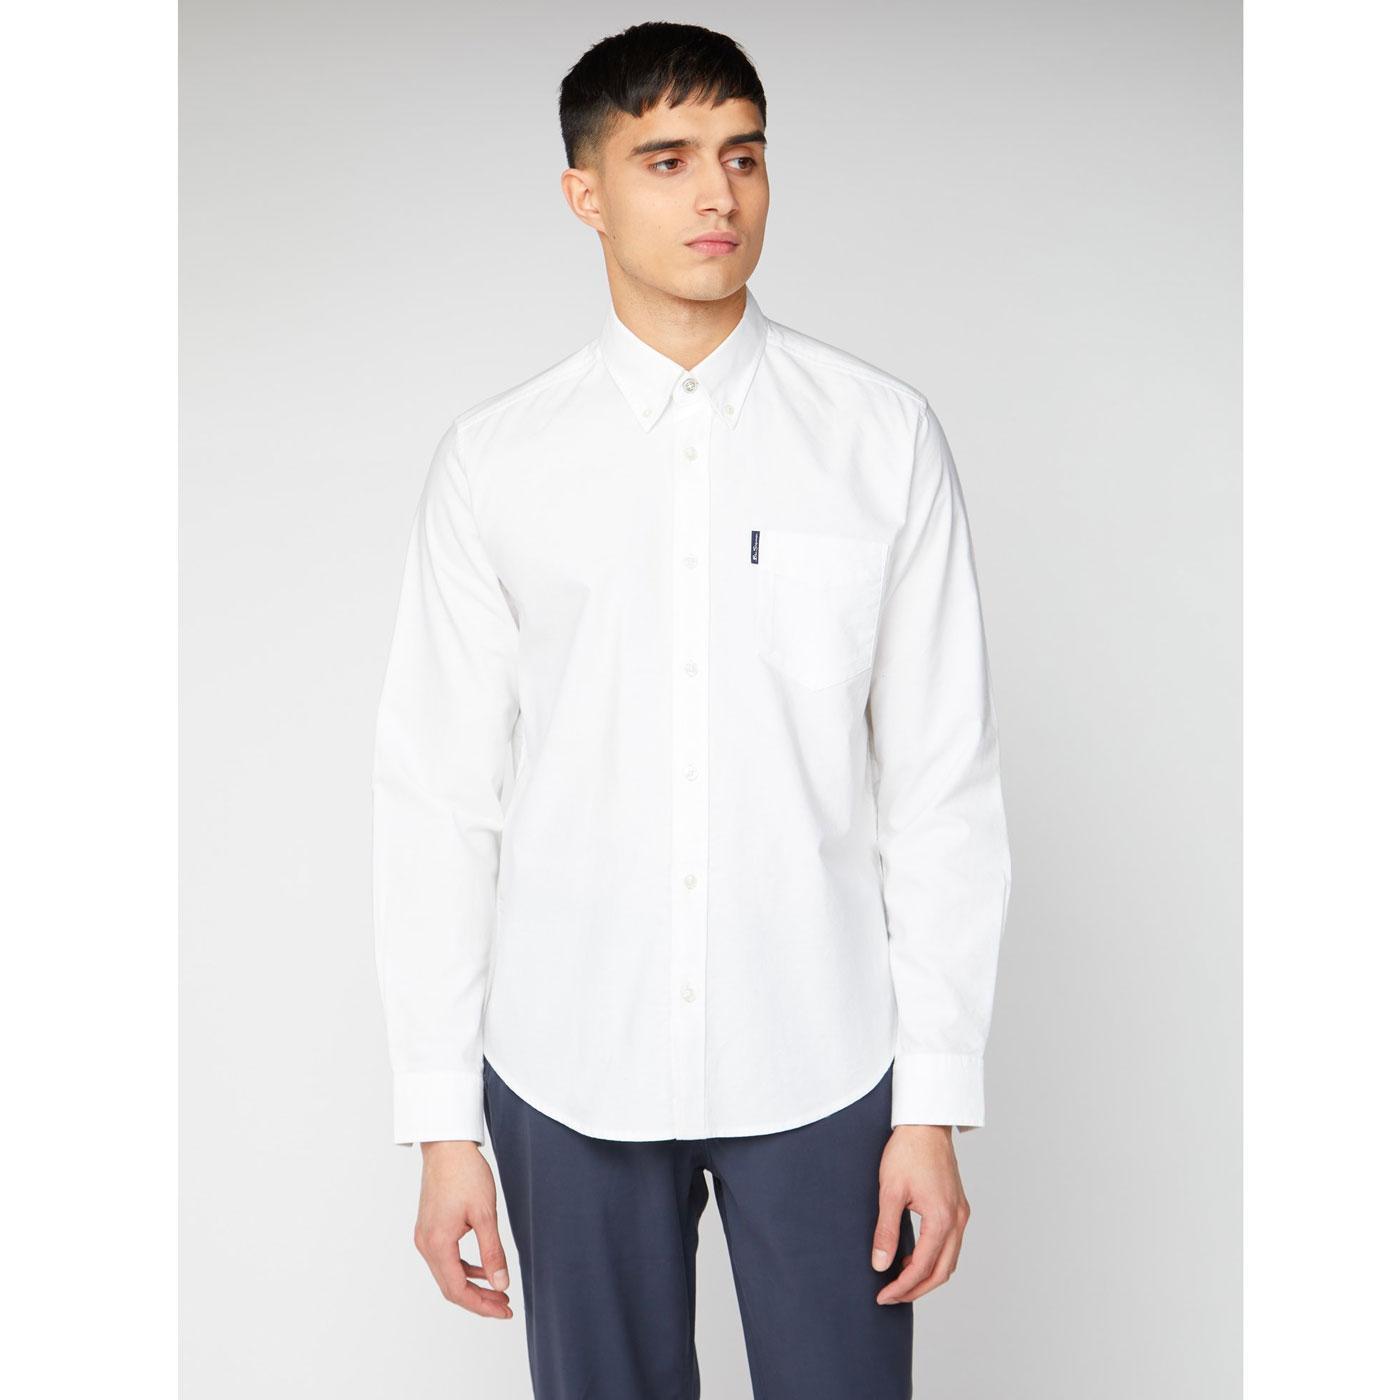 BEN SHERMAN Signature Long Sleeve Oxford Shirt (W)